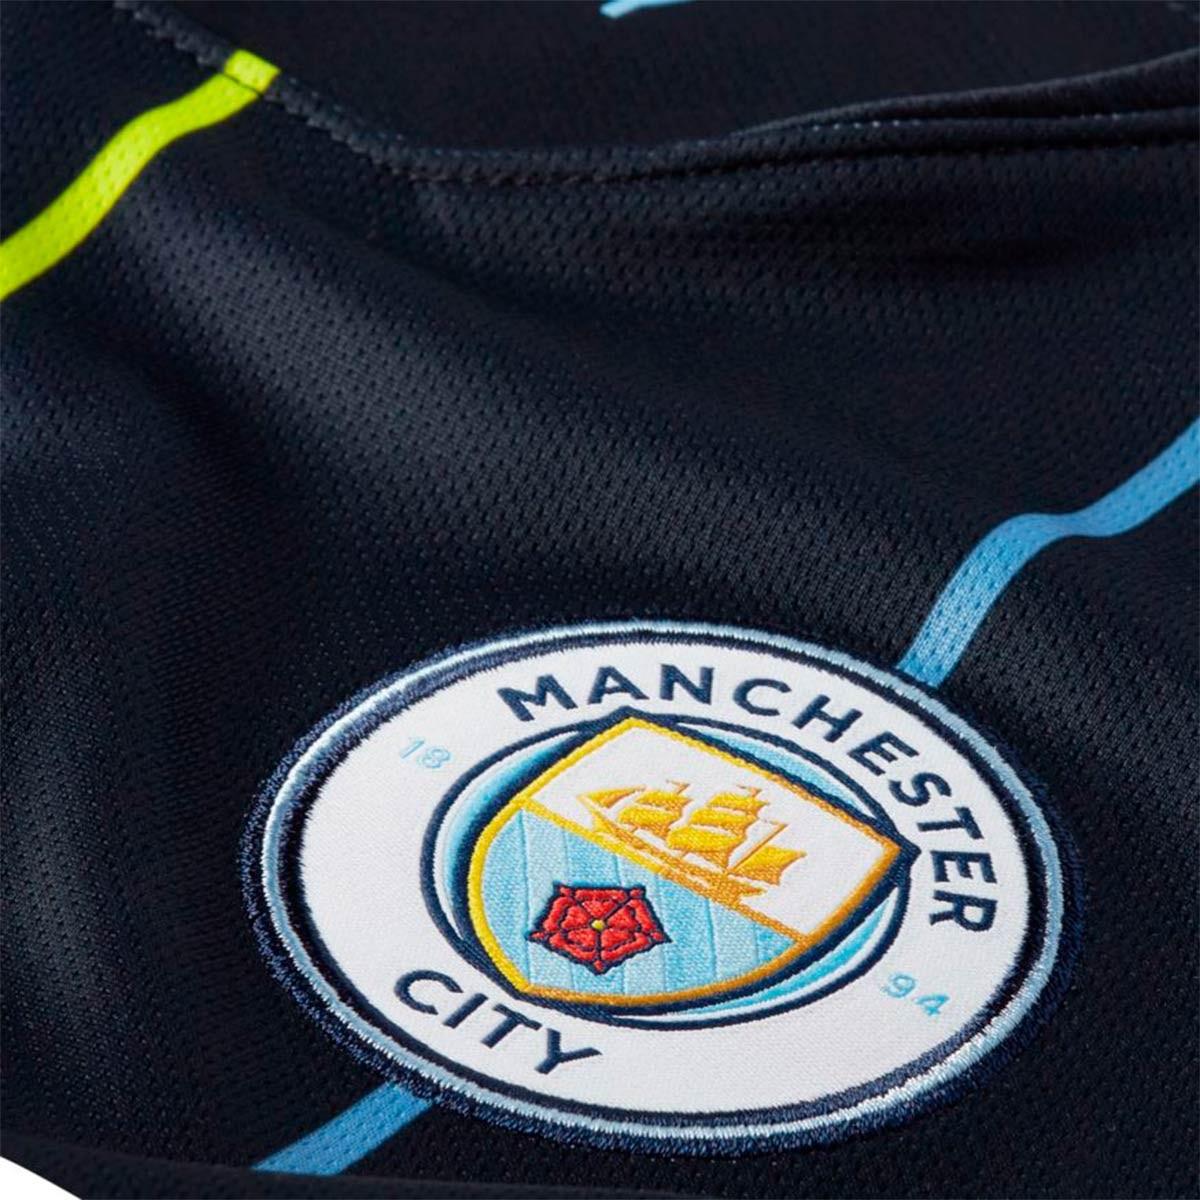 5a279319ae026 Jersey Nike Kids Manchester City FC Stadium 2018-2019 Away Dark  obsidian-White - Football store Fútbol Emotion